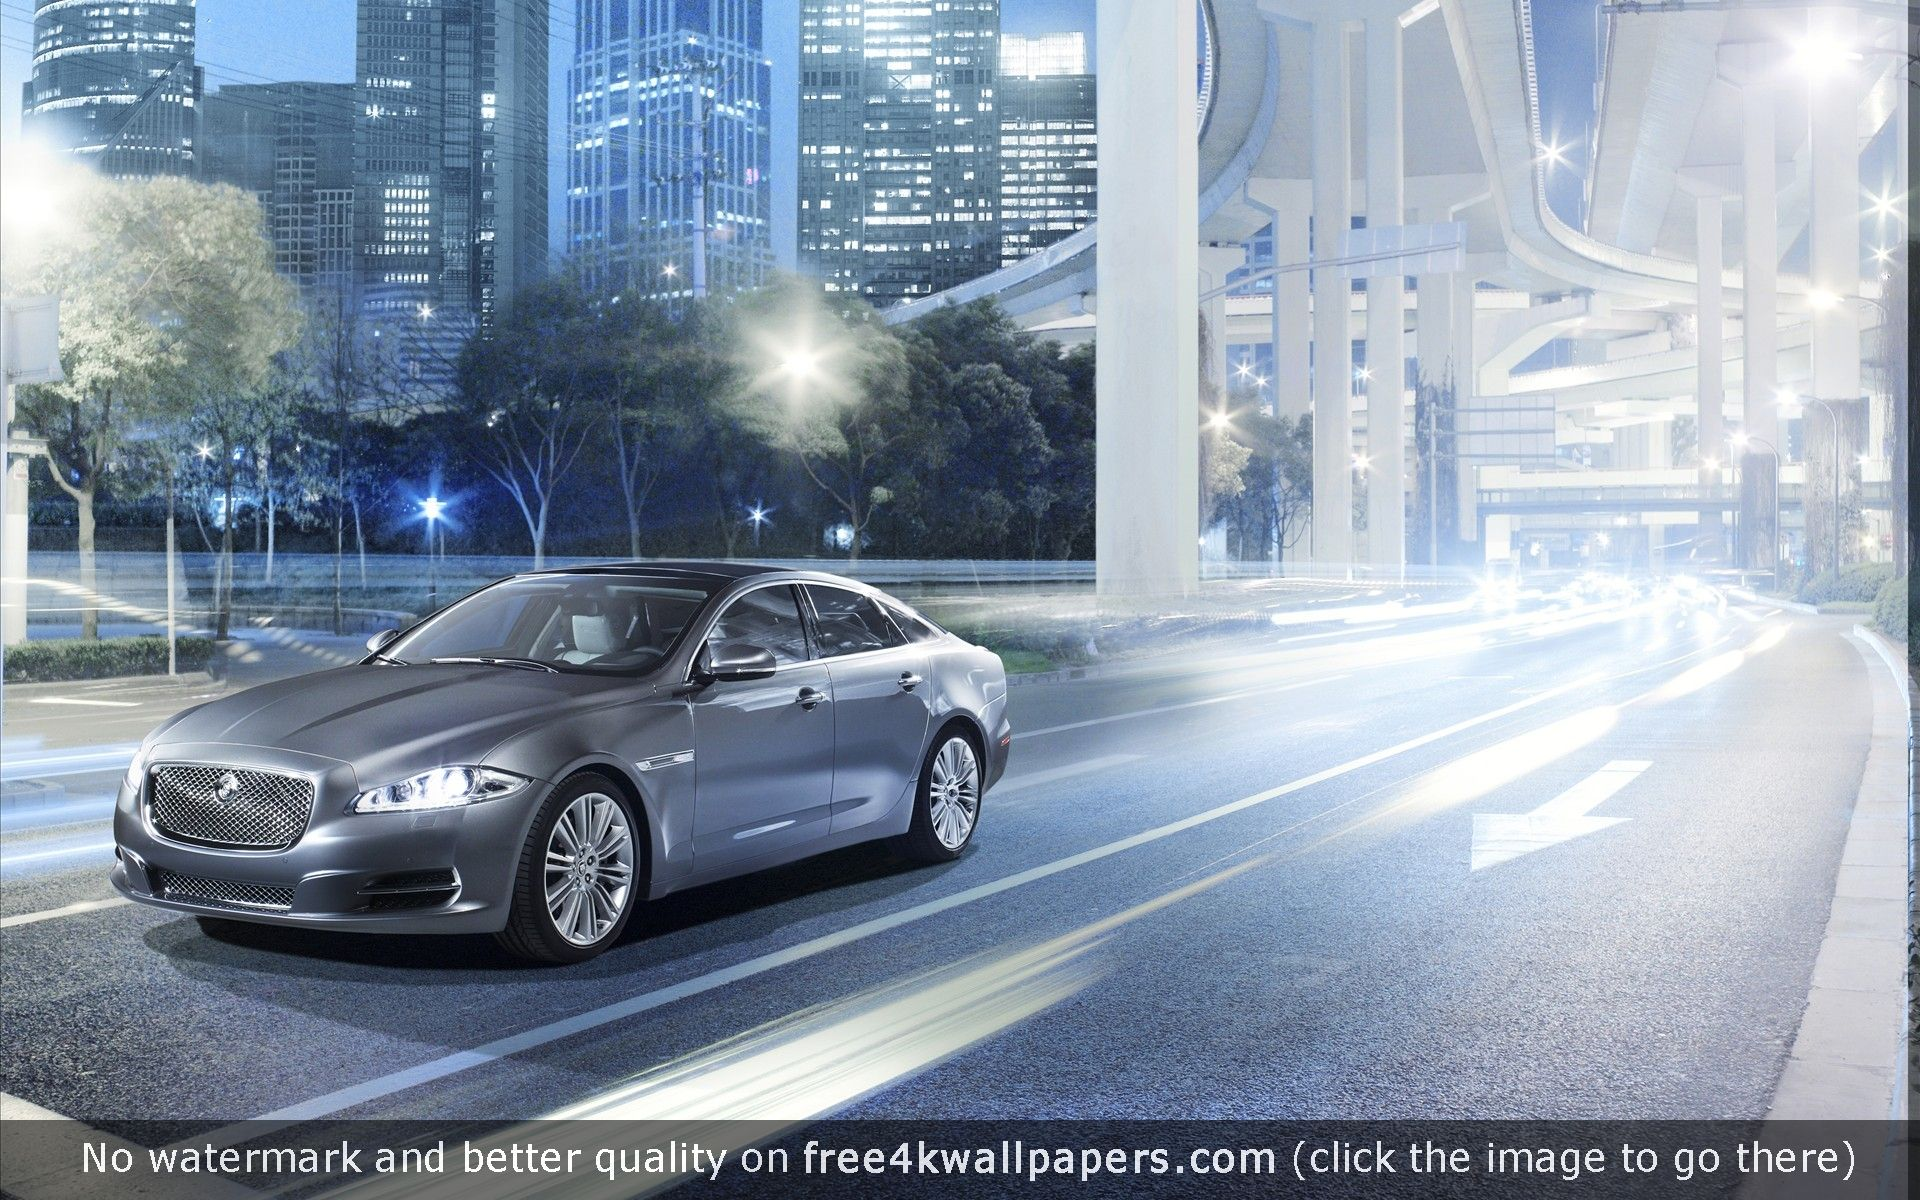 Jaguar XJ HD wallpaper - Download Jaguar XJ HD wallpaper for your desktop tablet or mobile device